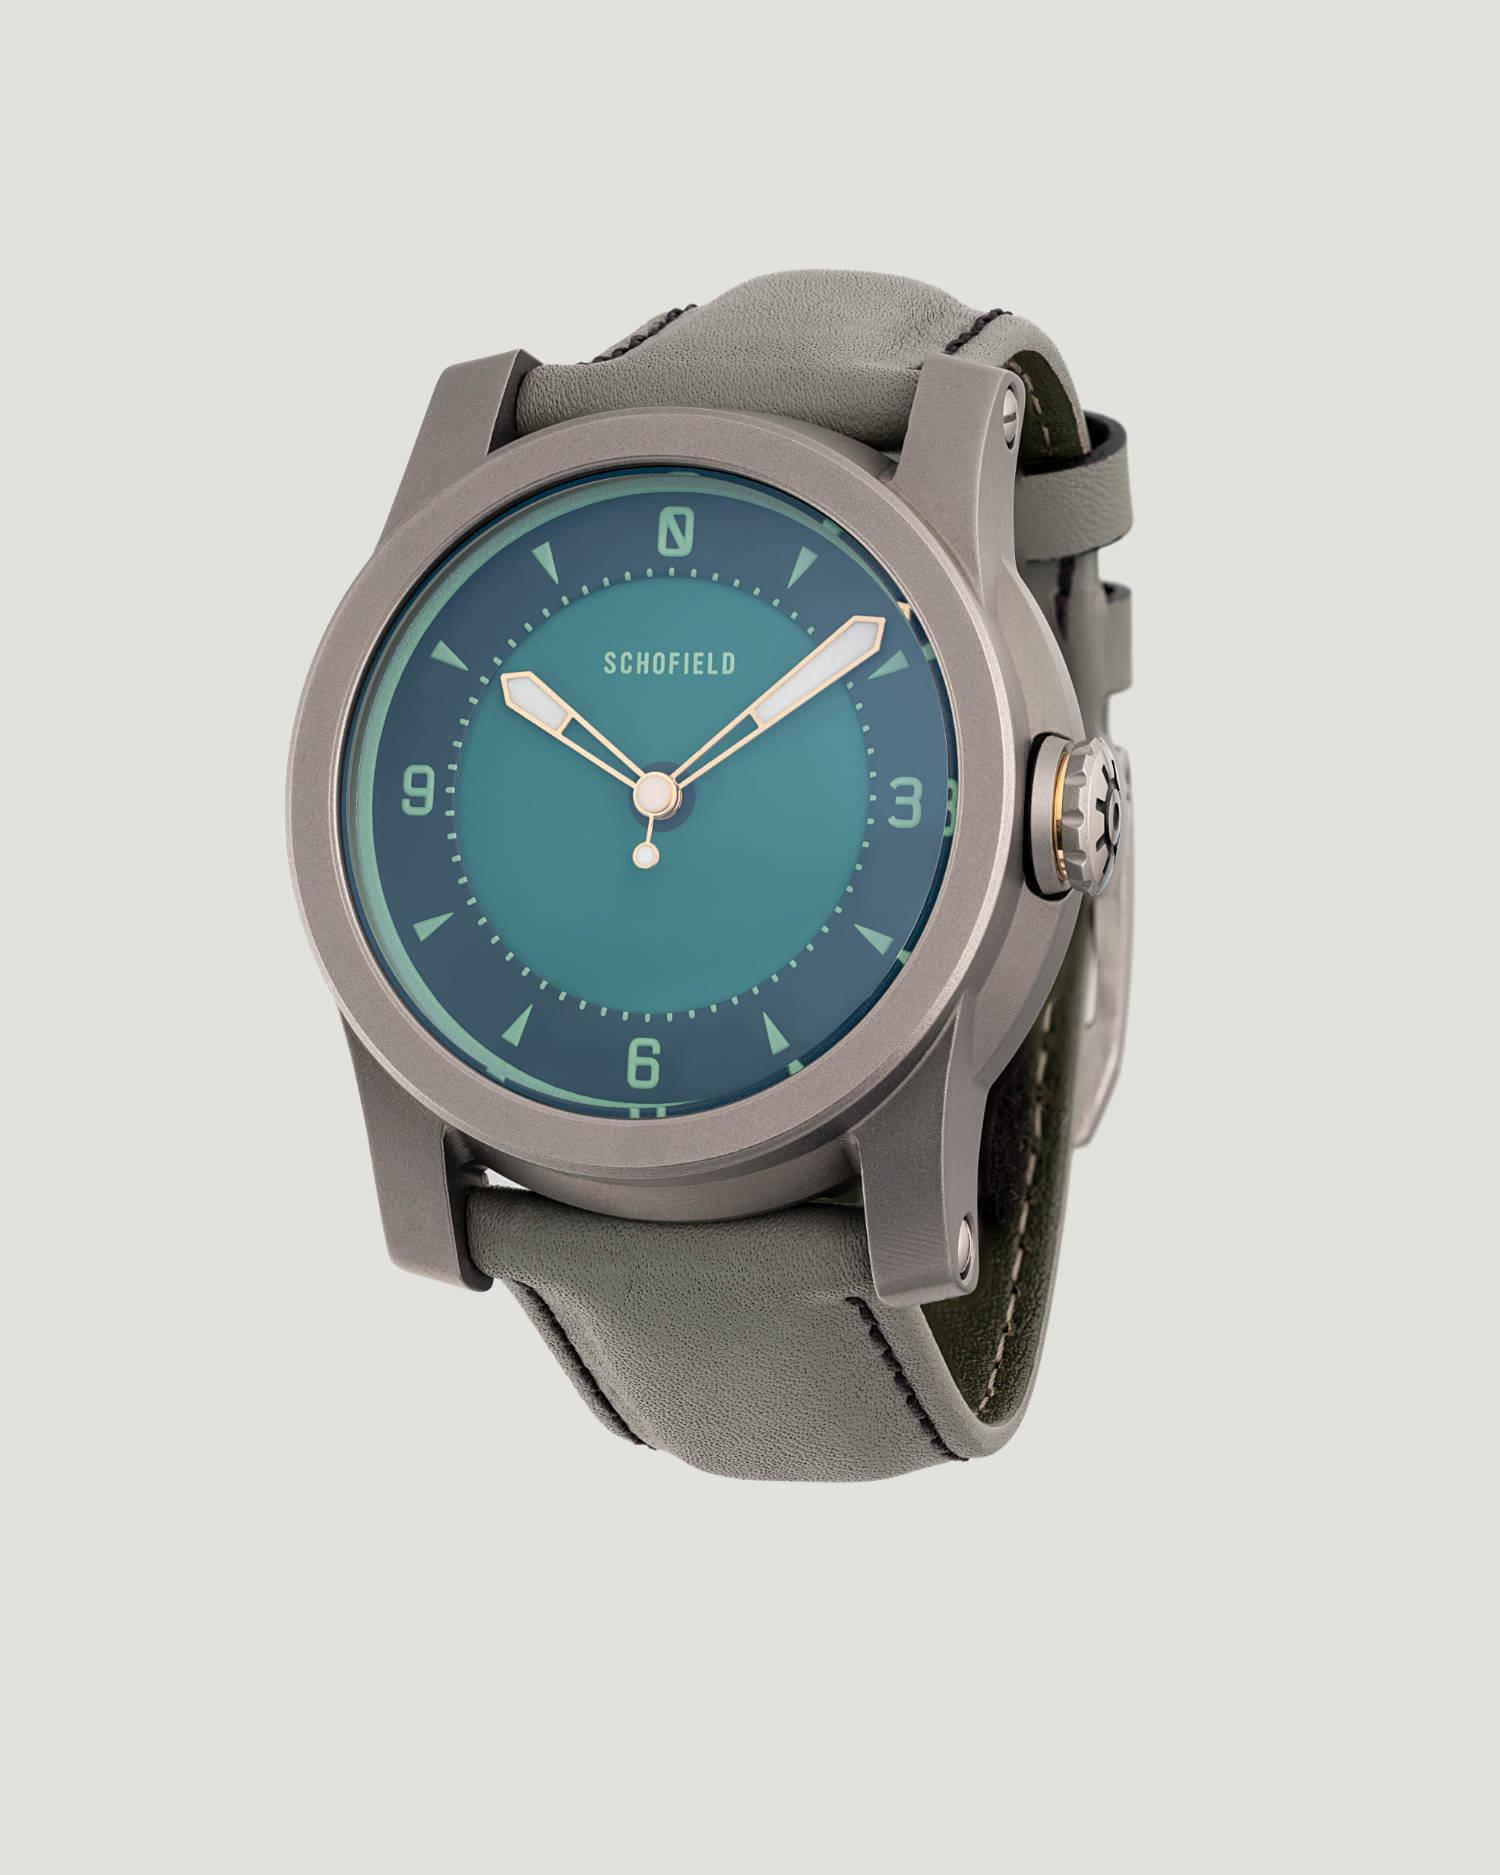 Limited edition titanium watch